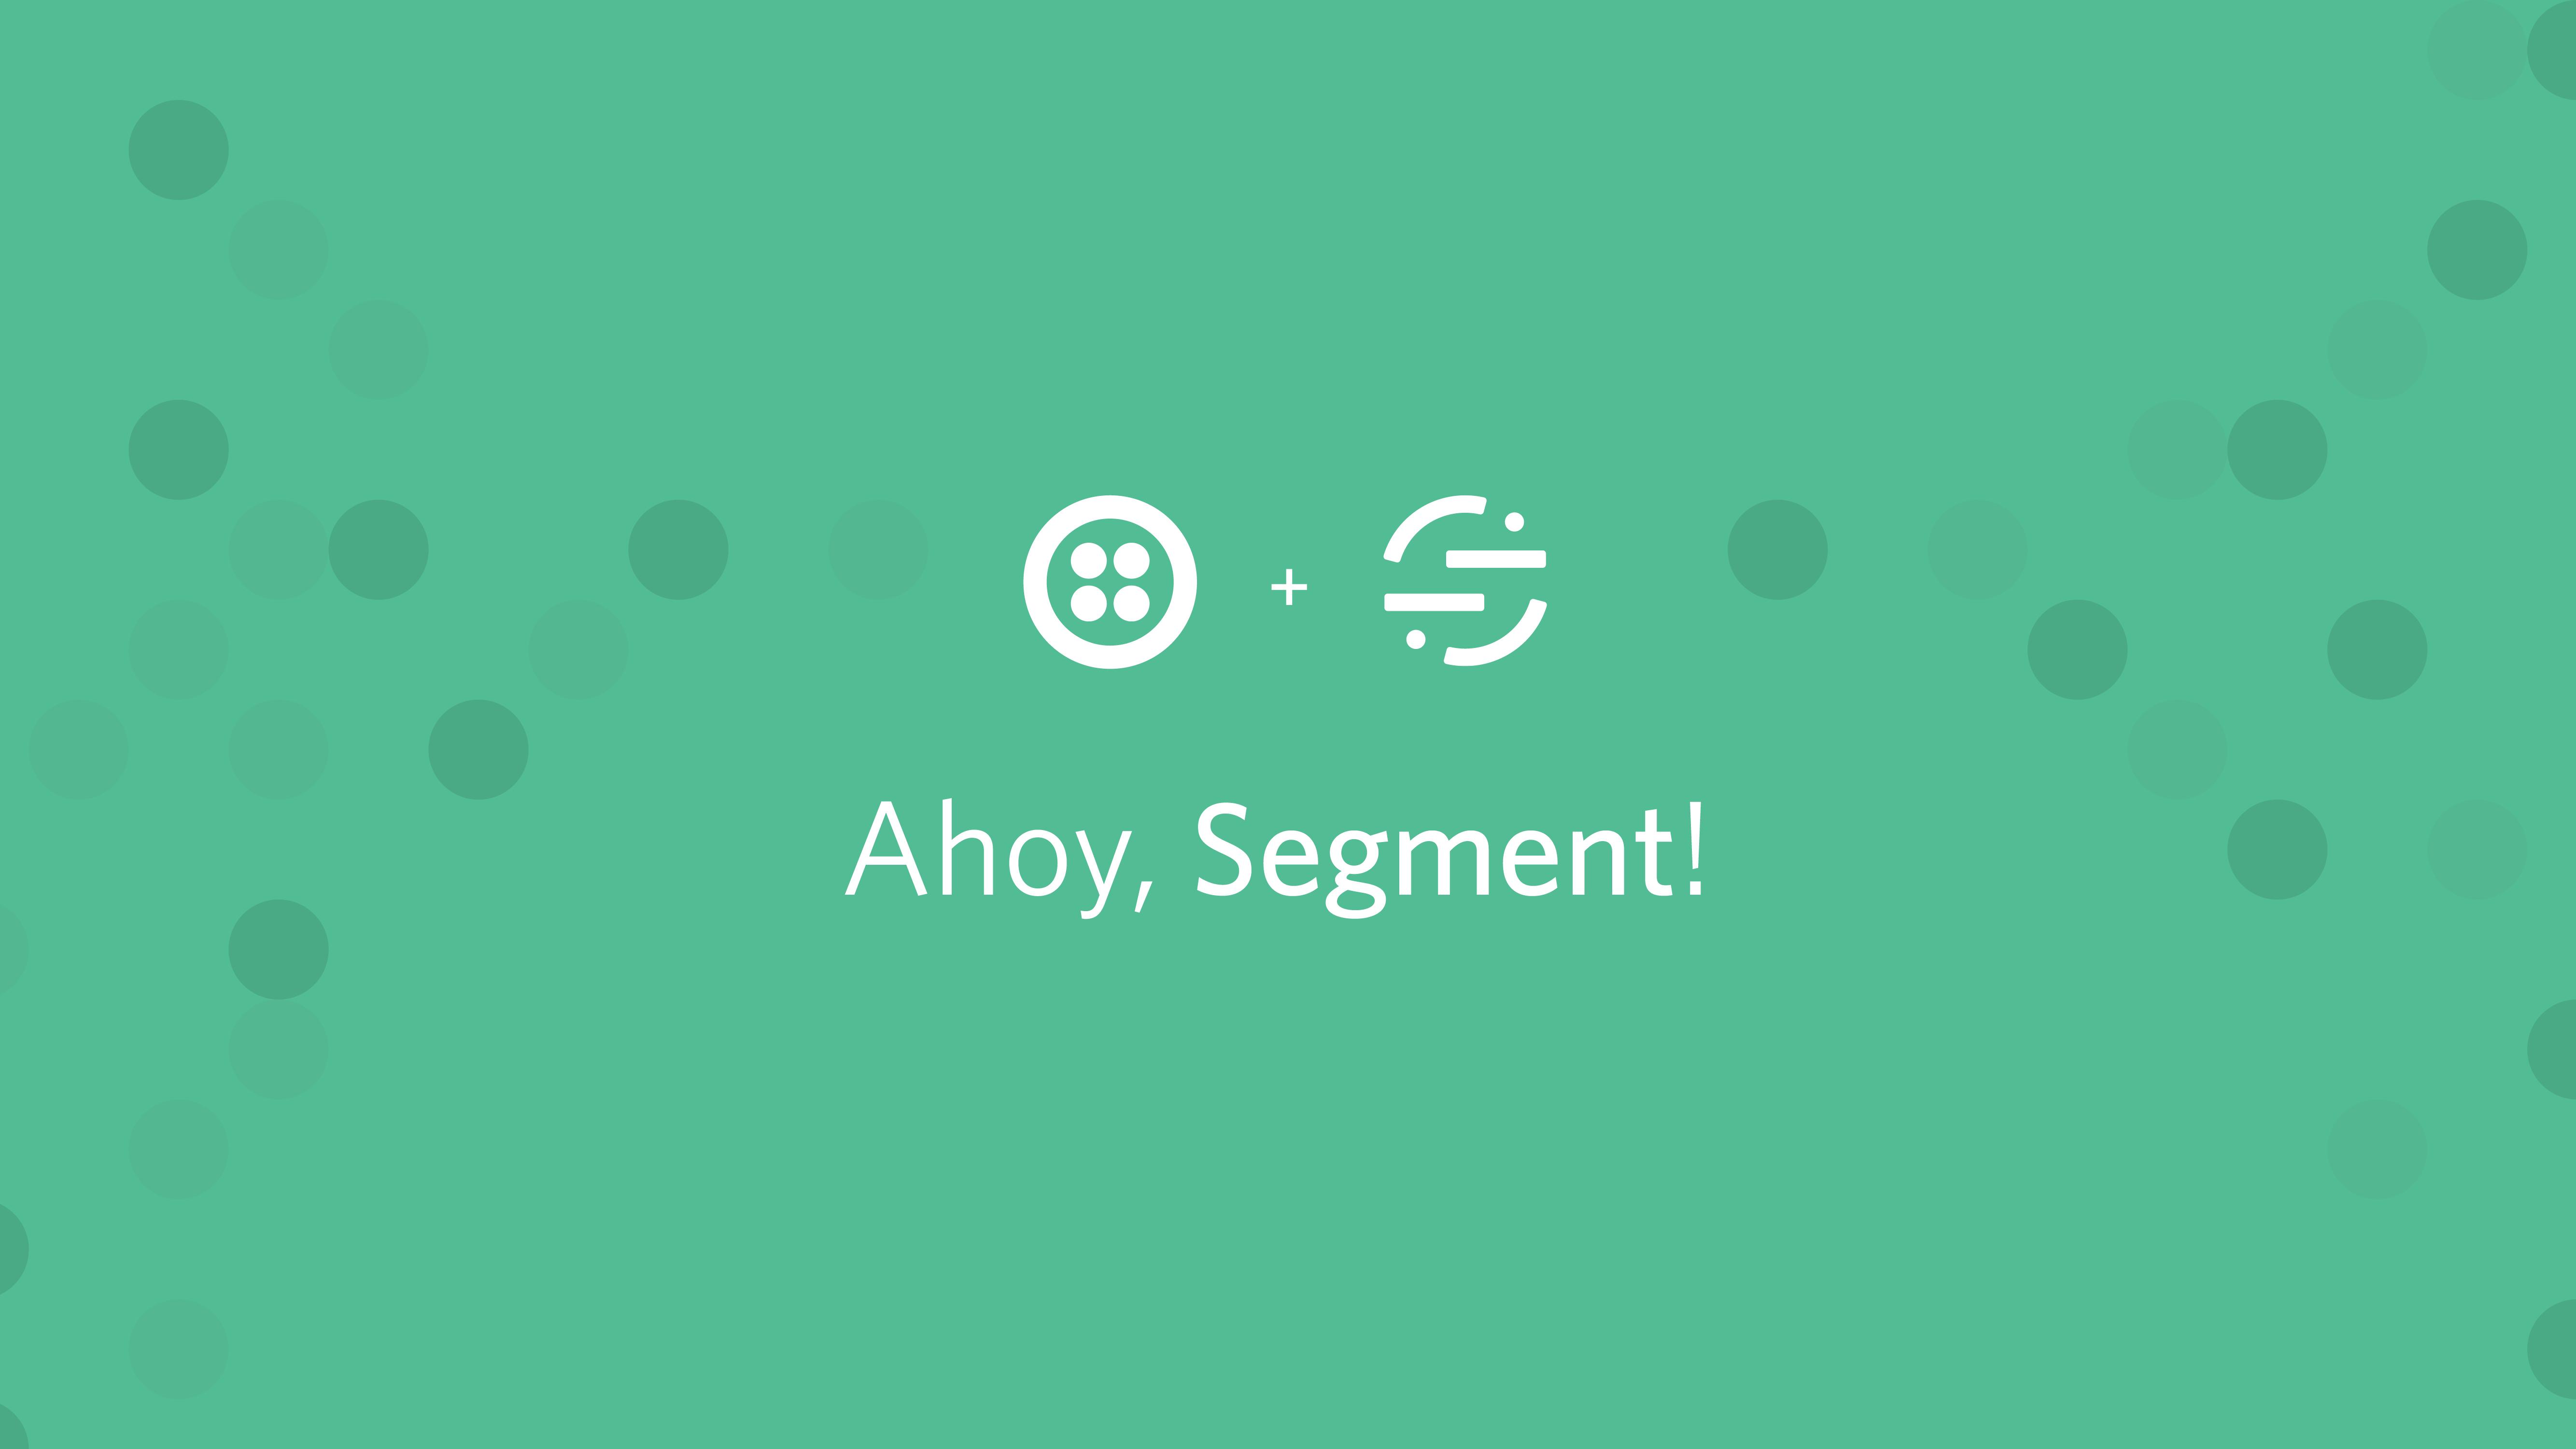 Why Twilio is Acquiring Segment, the Market-leading Customer Data Platform - Twilio